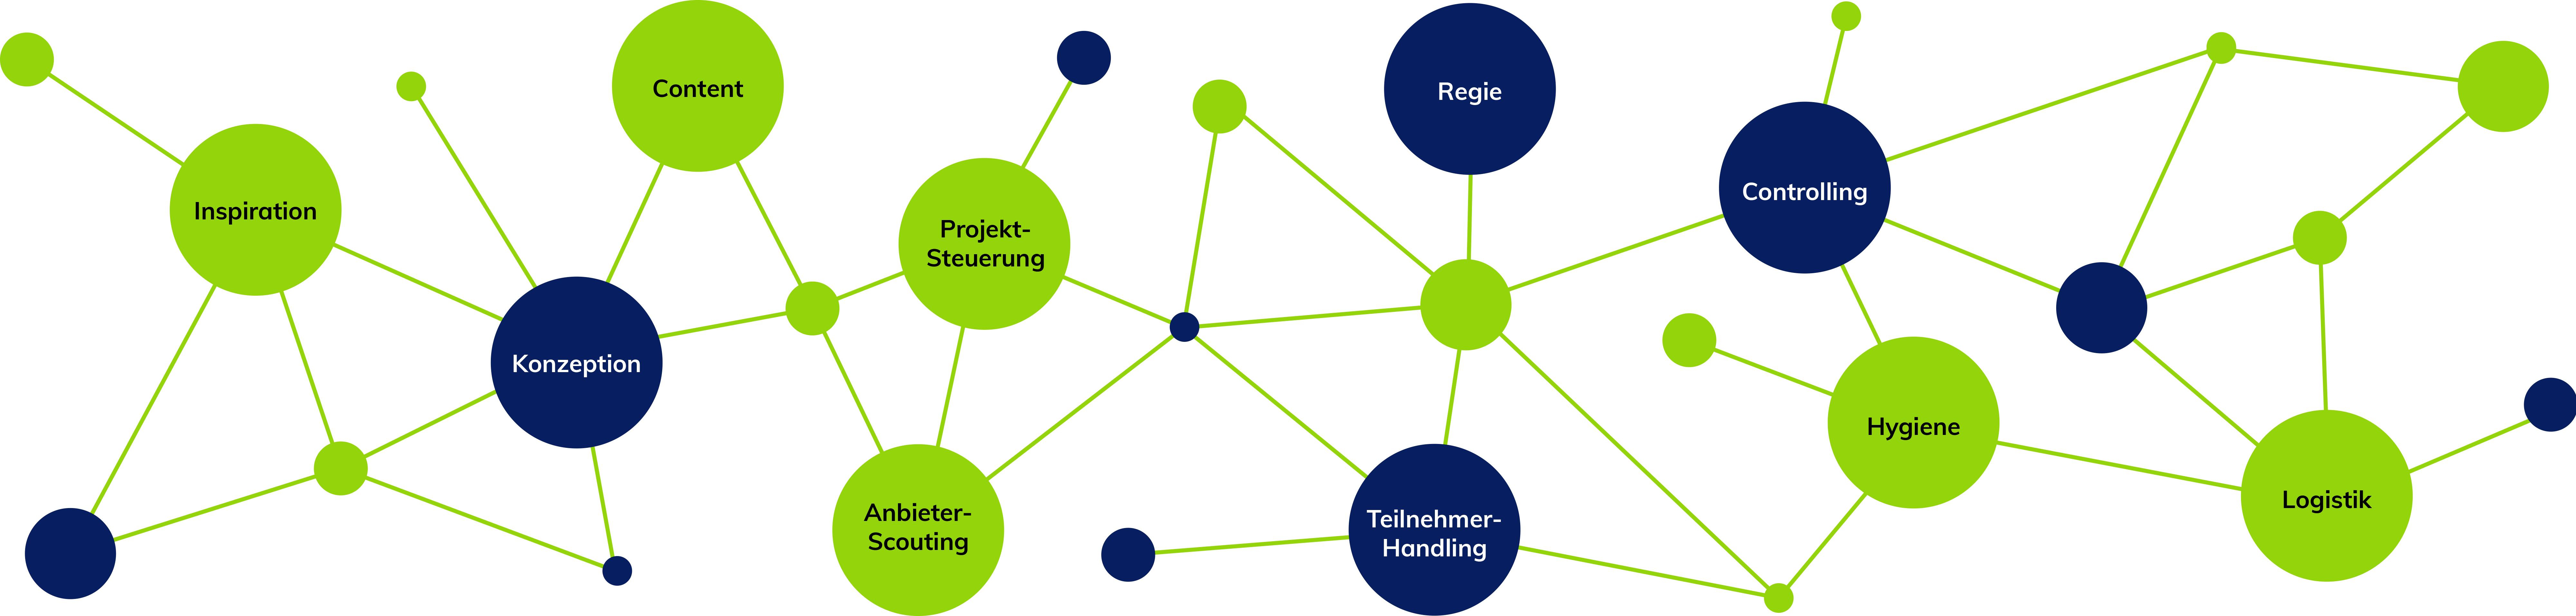 Eventmanagement - Atlantik Network